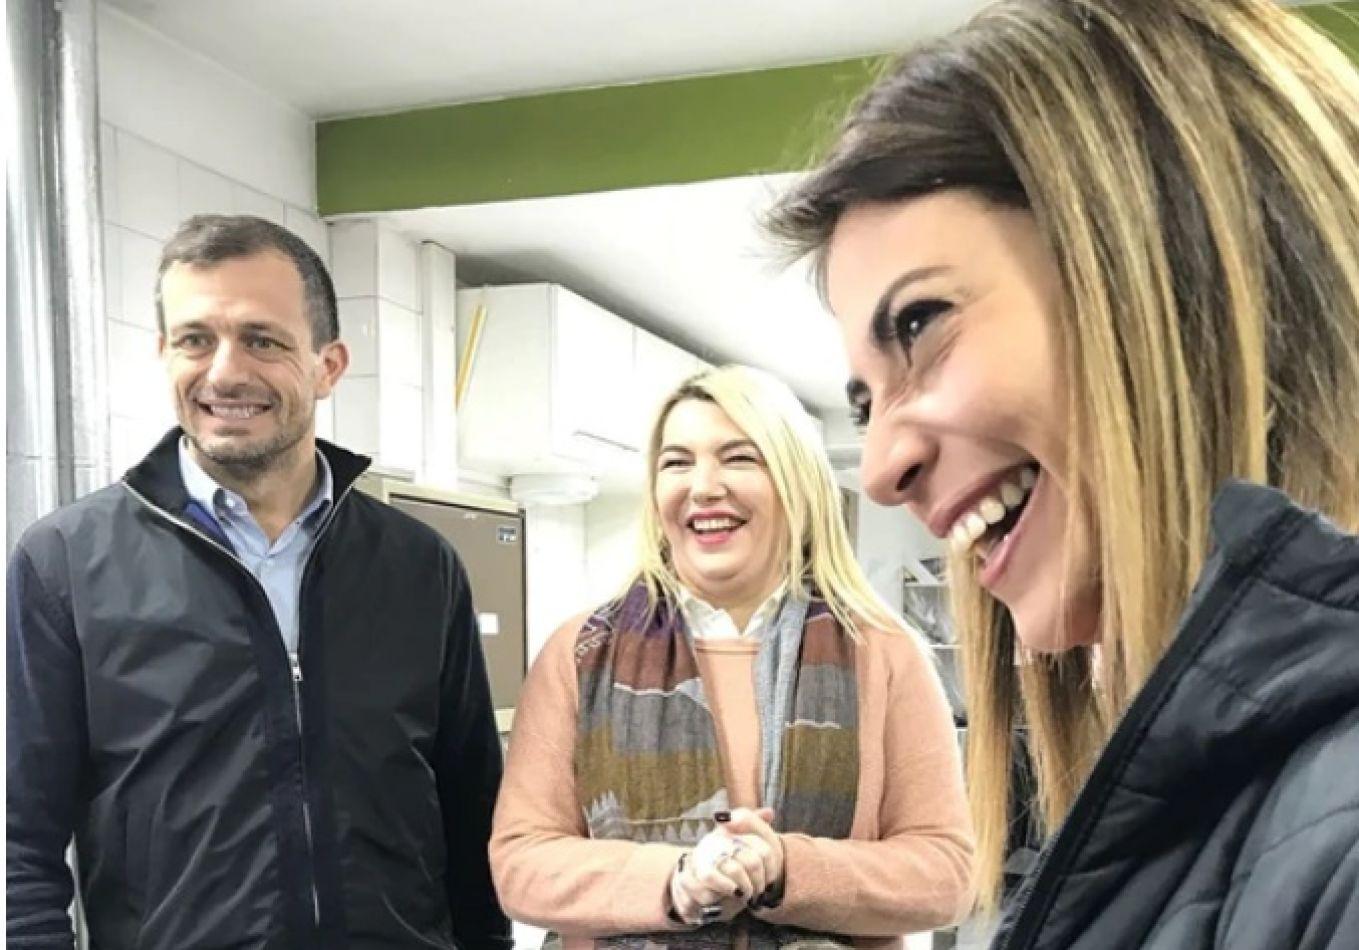 Eduardo 'Bali' Bucca y Florencia Casamiquela, junto a Bertone en Ushuaia.